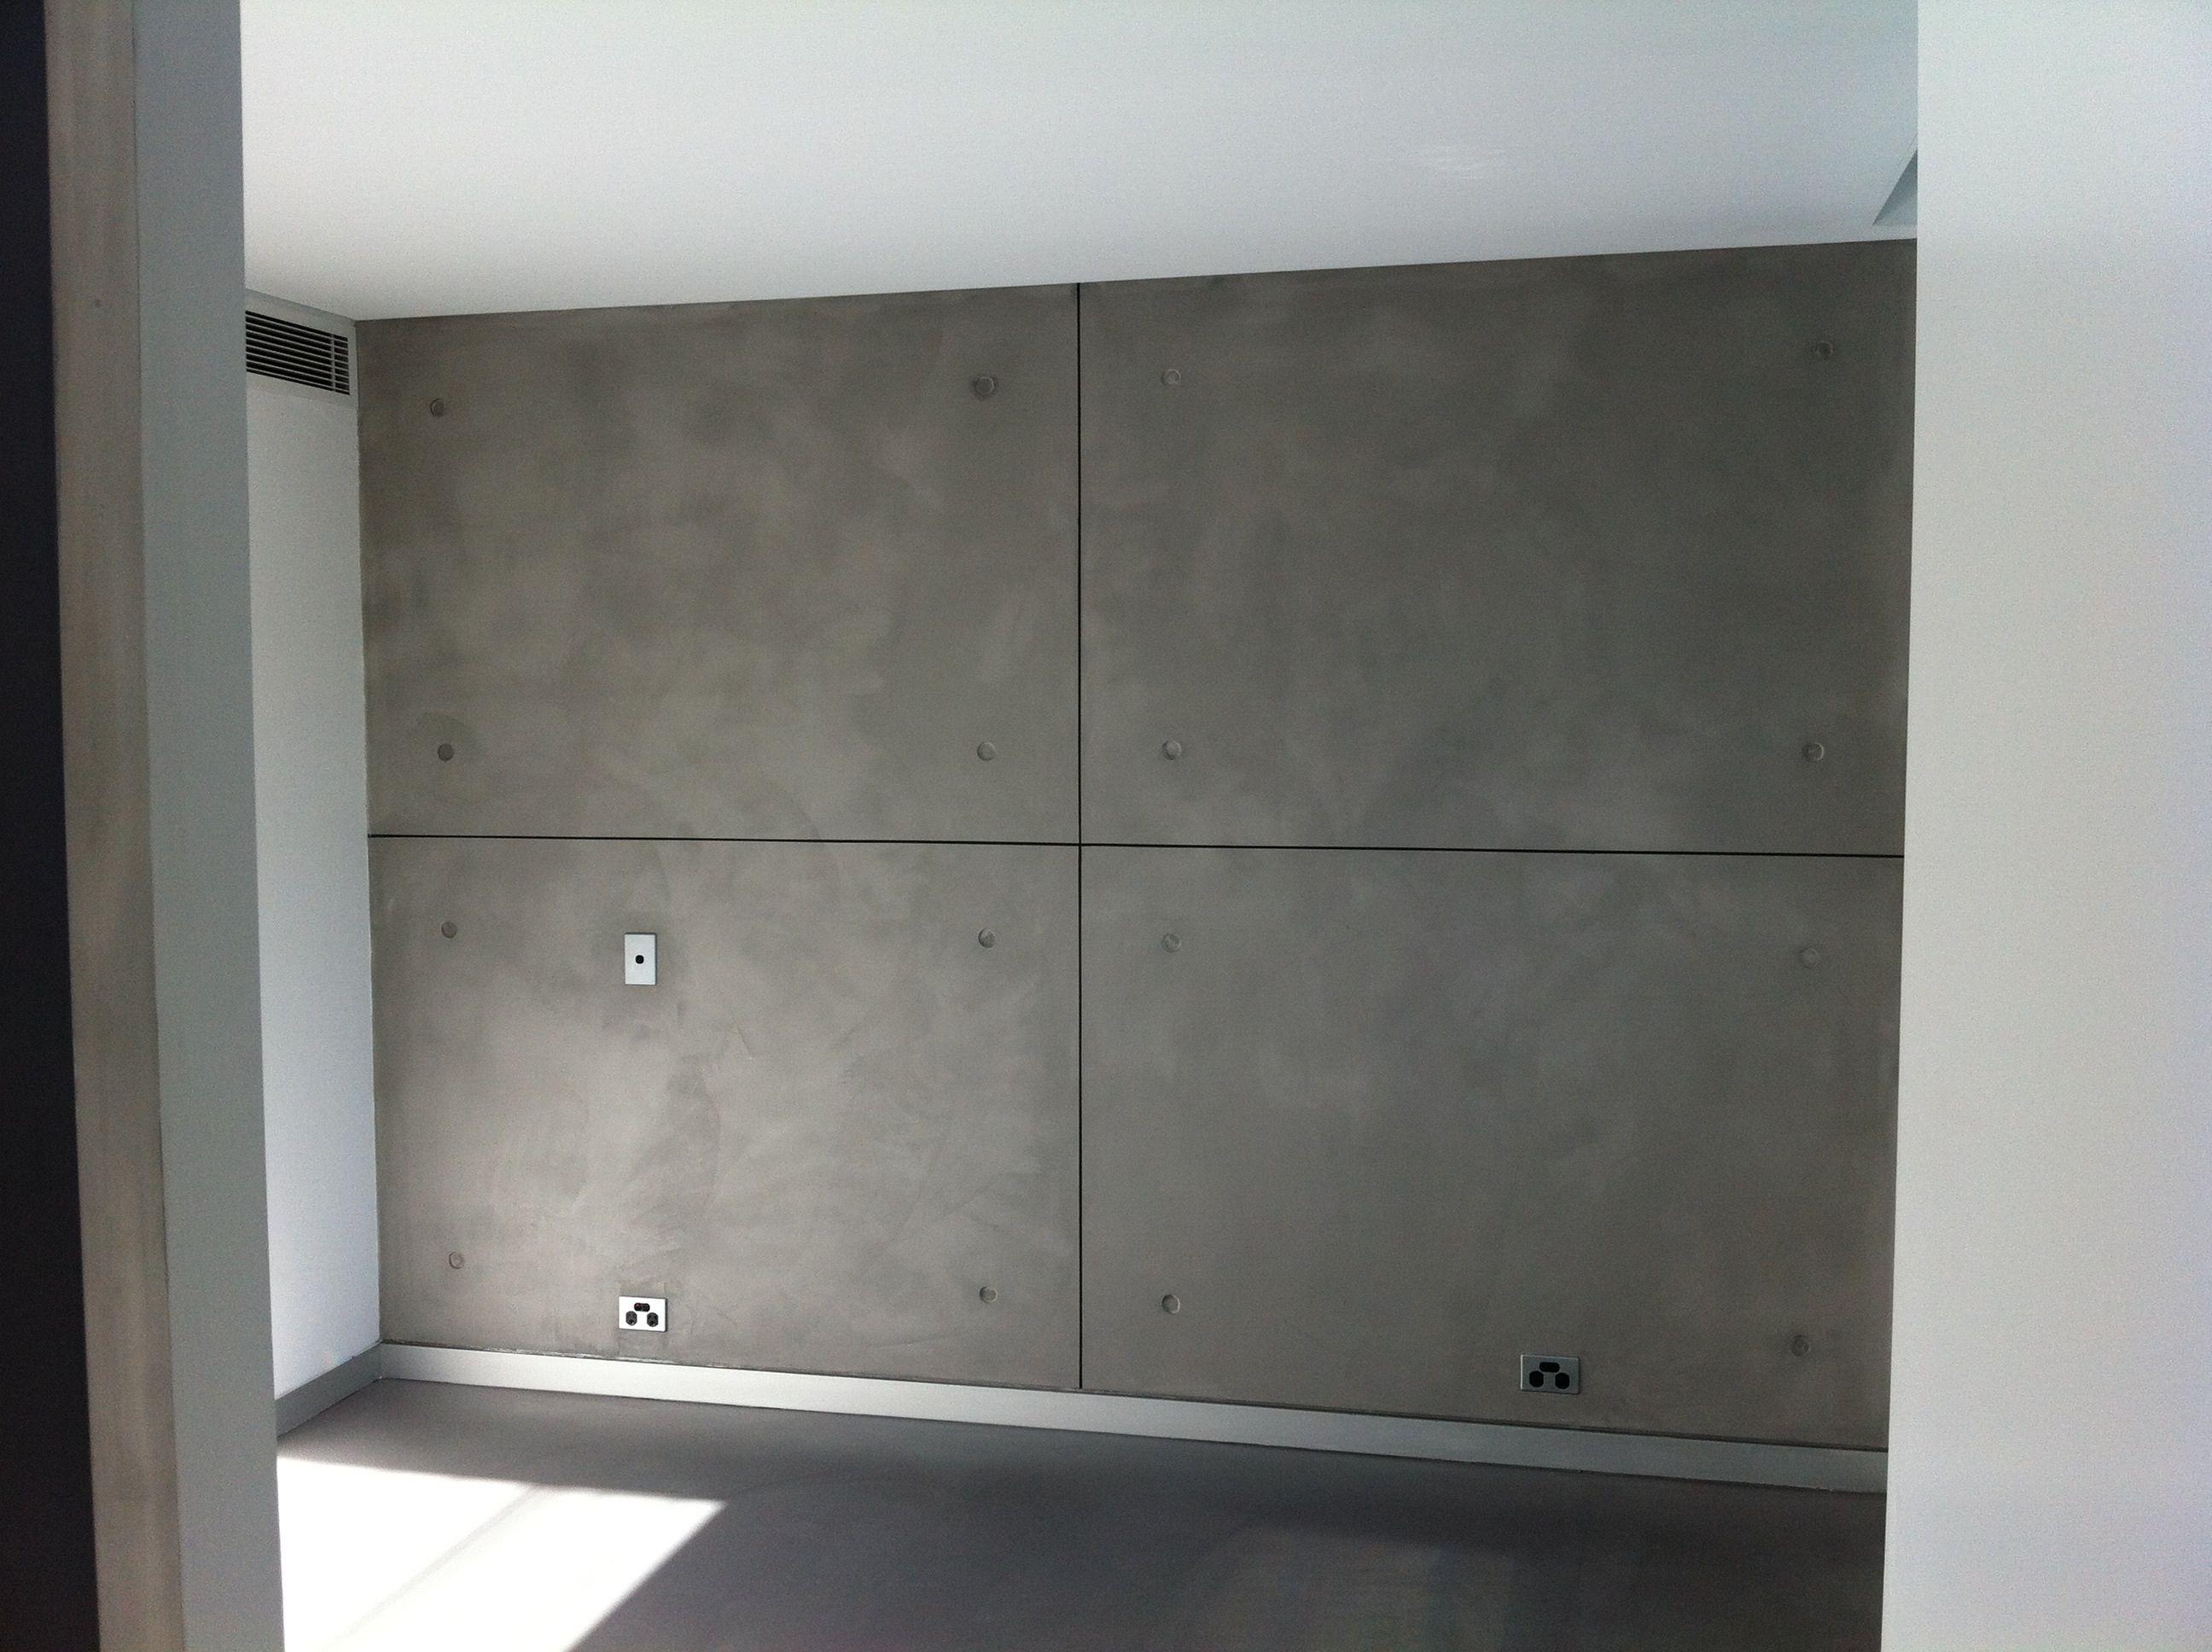 Honestone Professional Commercial Polished Flooring Concrete Floors Grinding And Cheap Polishing Services Syd Terrazzo Flooring Concrete Floors Polish Floor